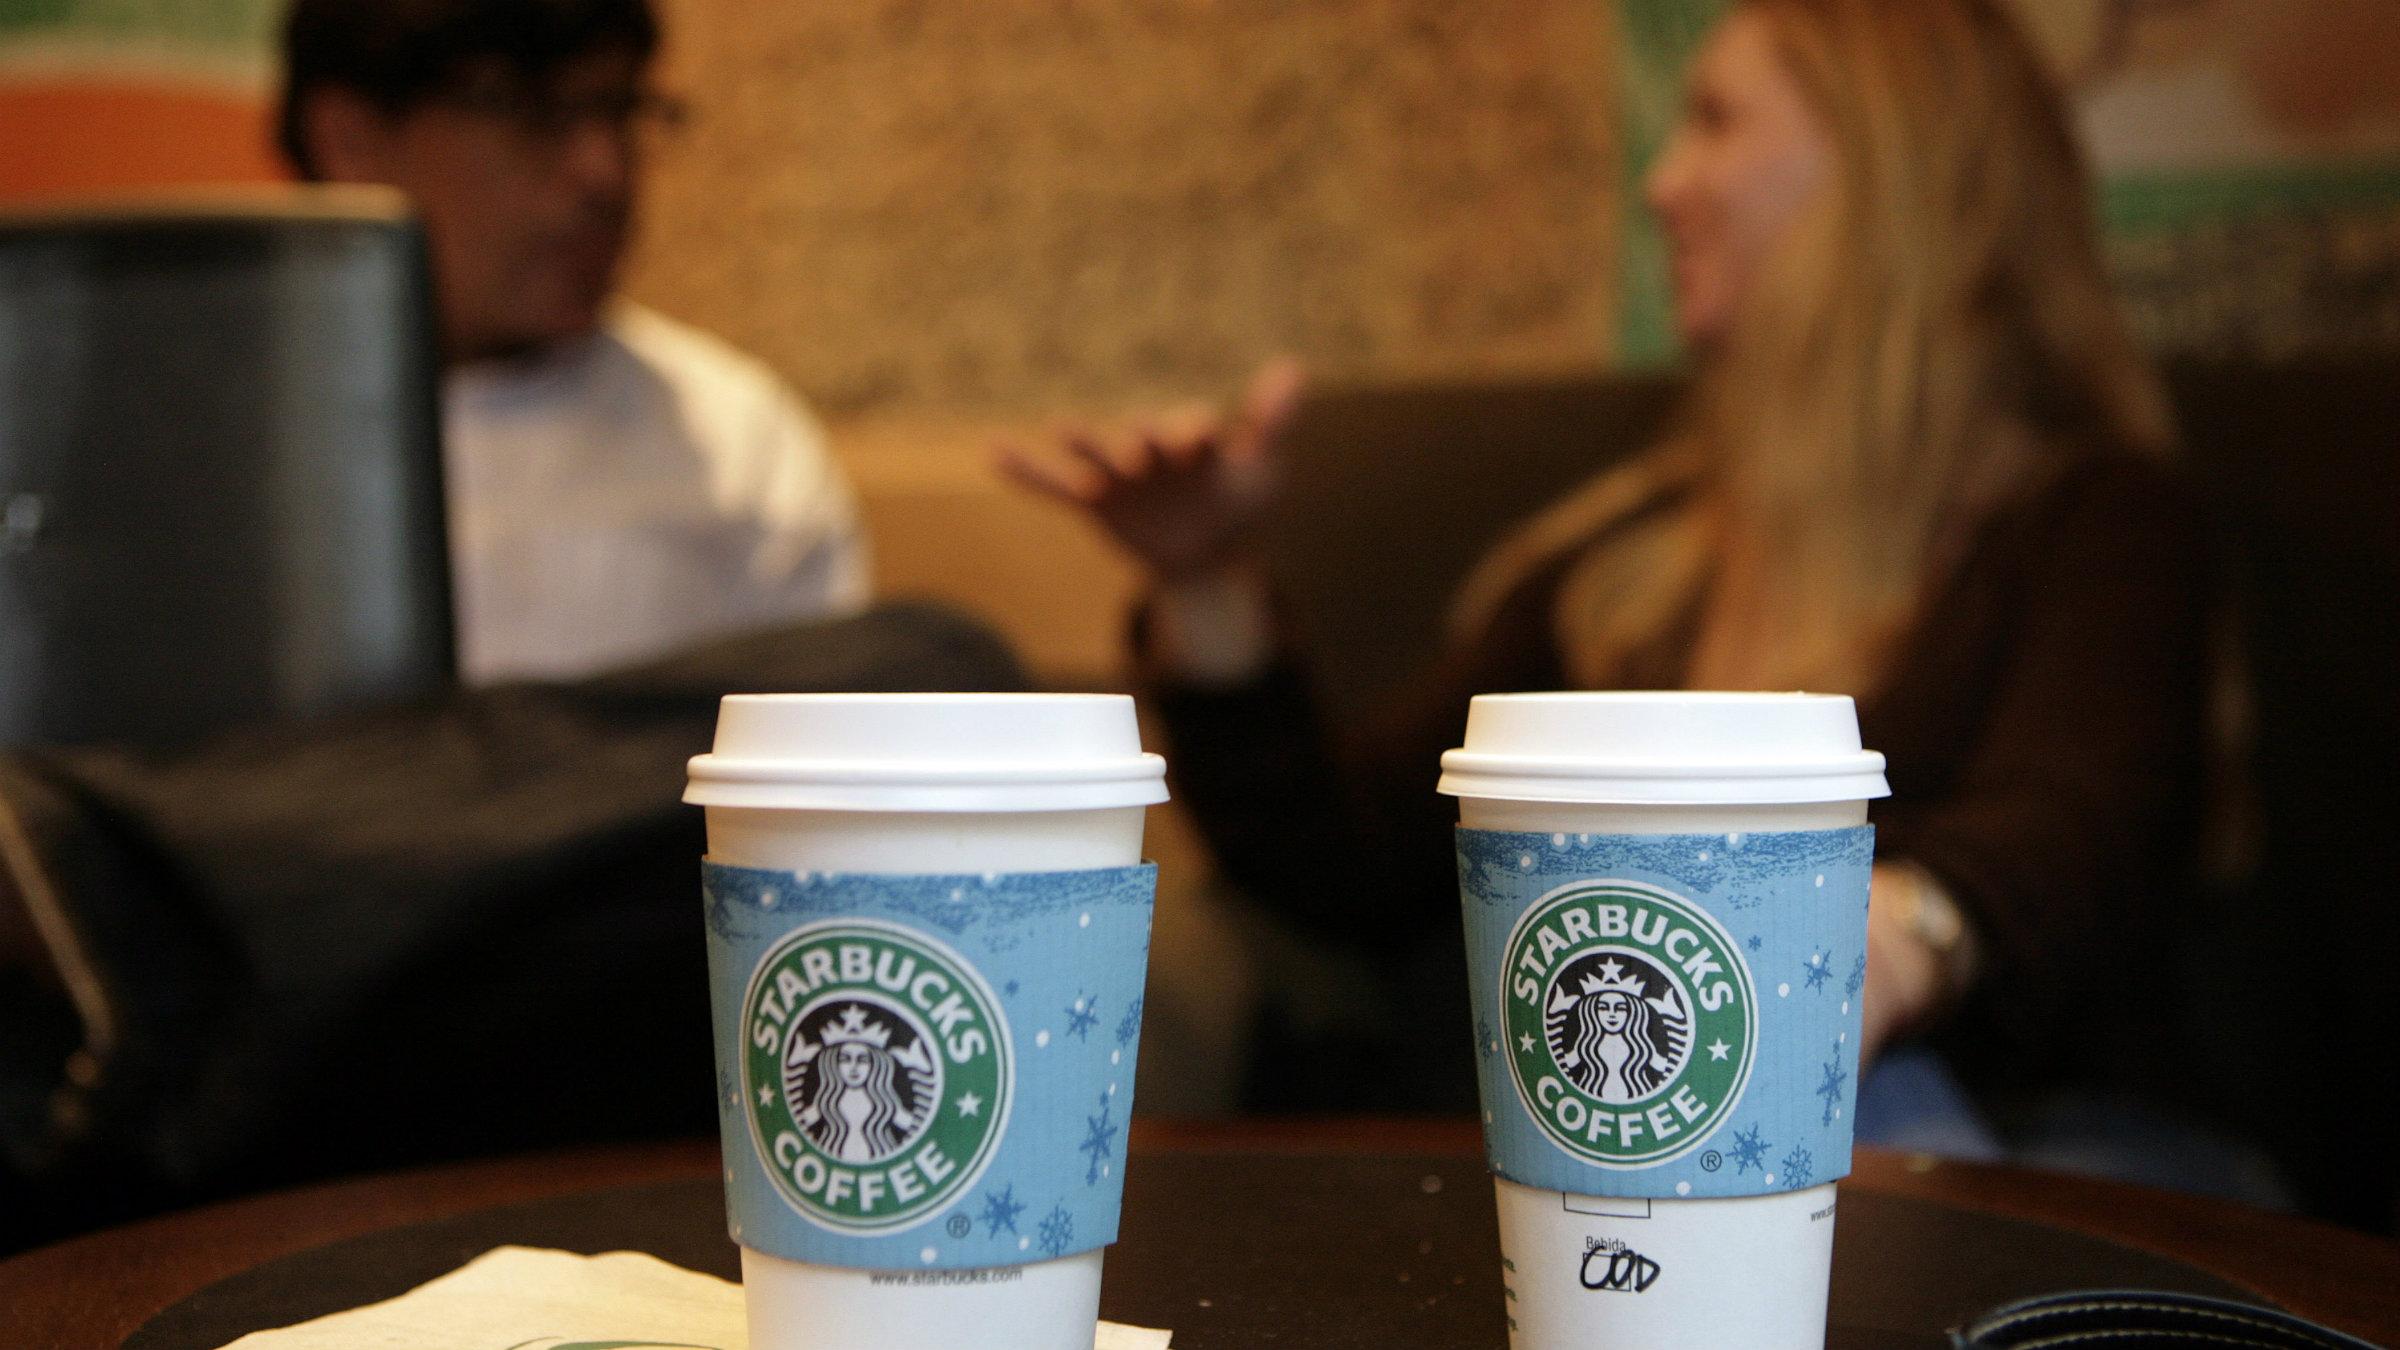 Starbucks customers talk in the store on Sao Paulo's Alameda Santos, June 11, 2008. REUTERS/Rickey Rogers (BRAZIL)